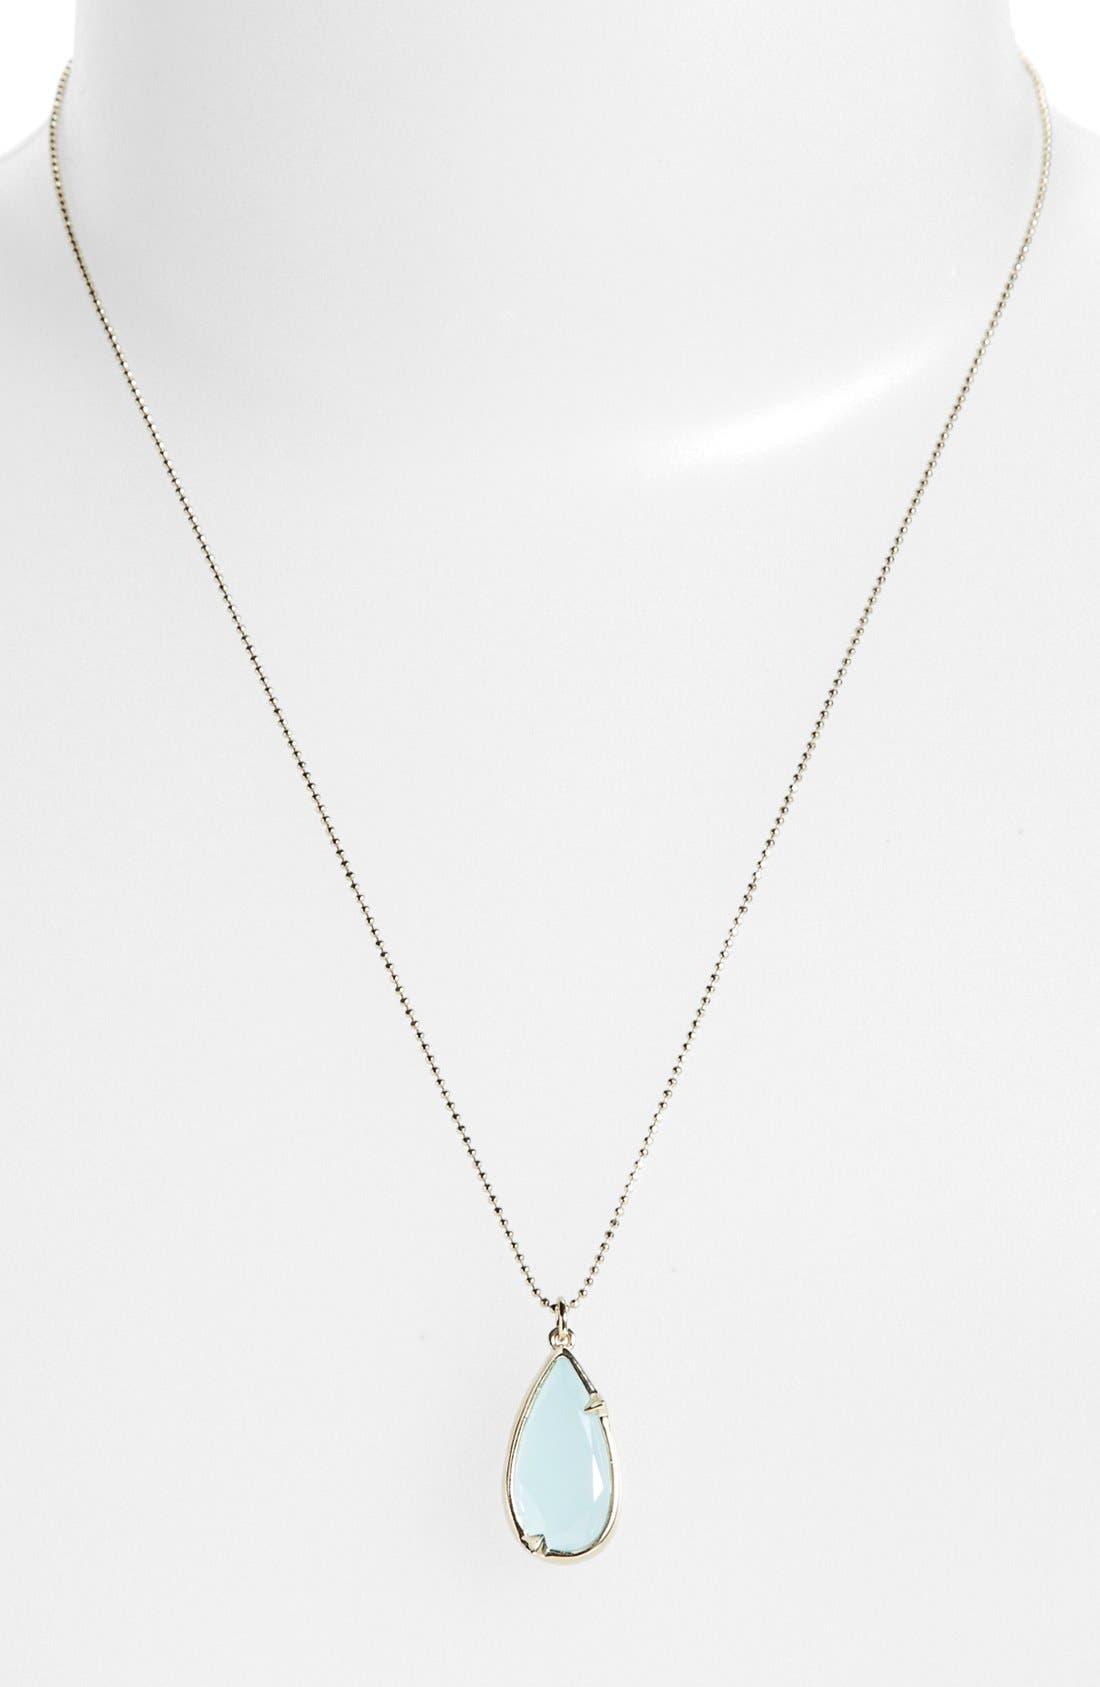 Alternate Image 1 Selected - Melinda Maria 'Thorn - Helena' Teardrop Pendant Necklace